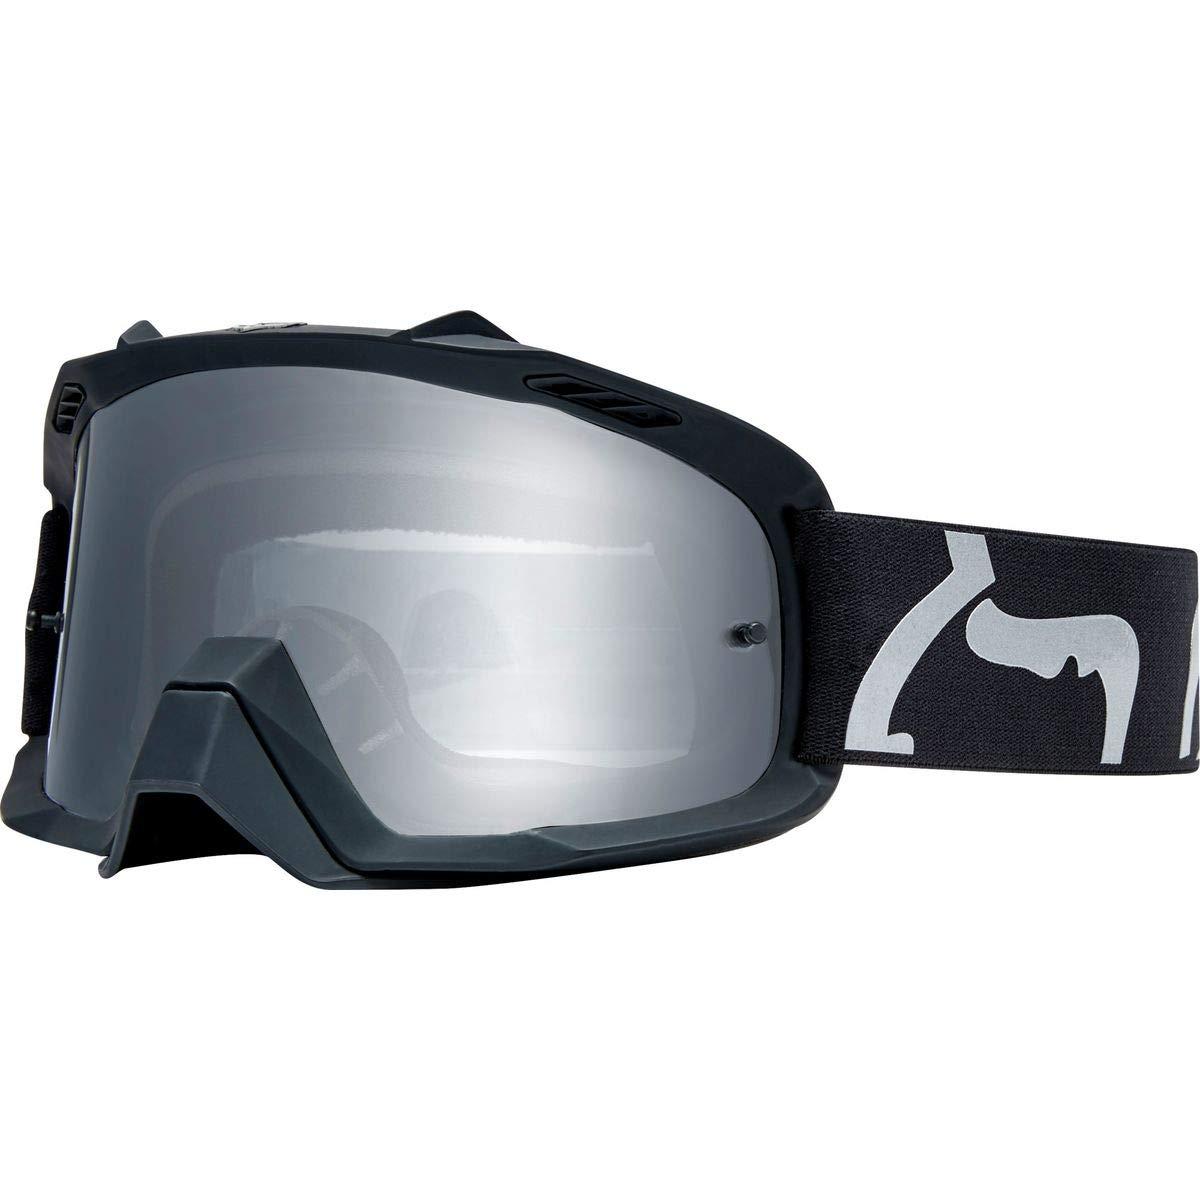 Black /Vetro Grey dimensioni OS Fox occhiali Air Space Sabbia/